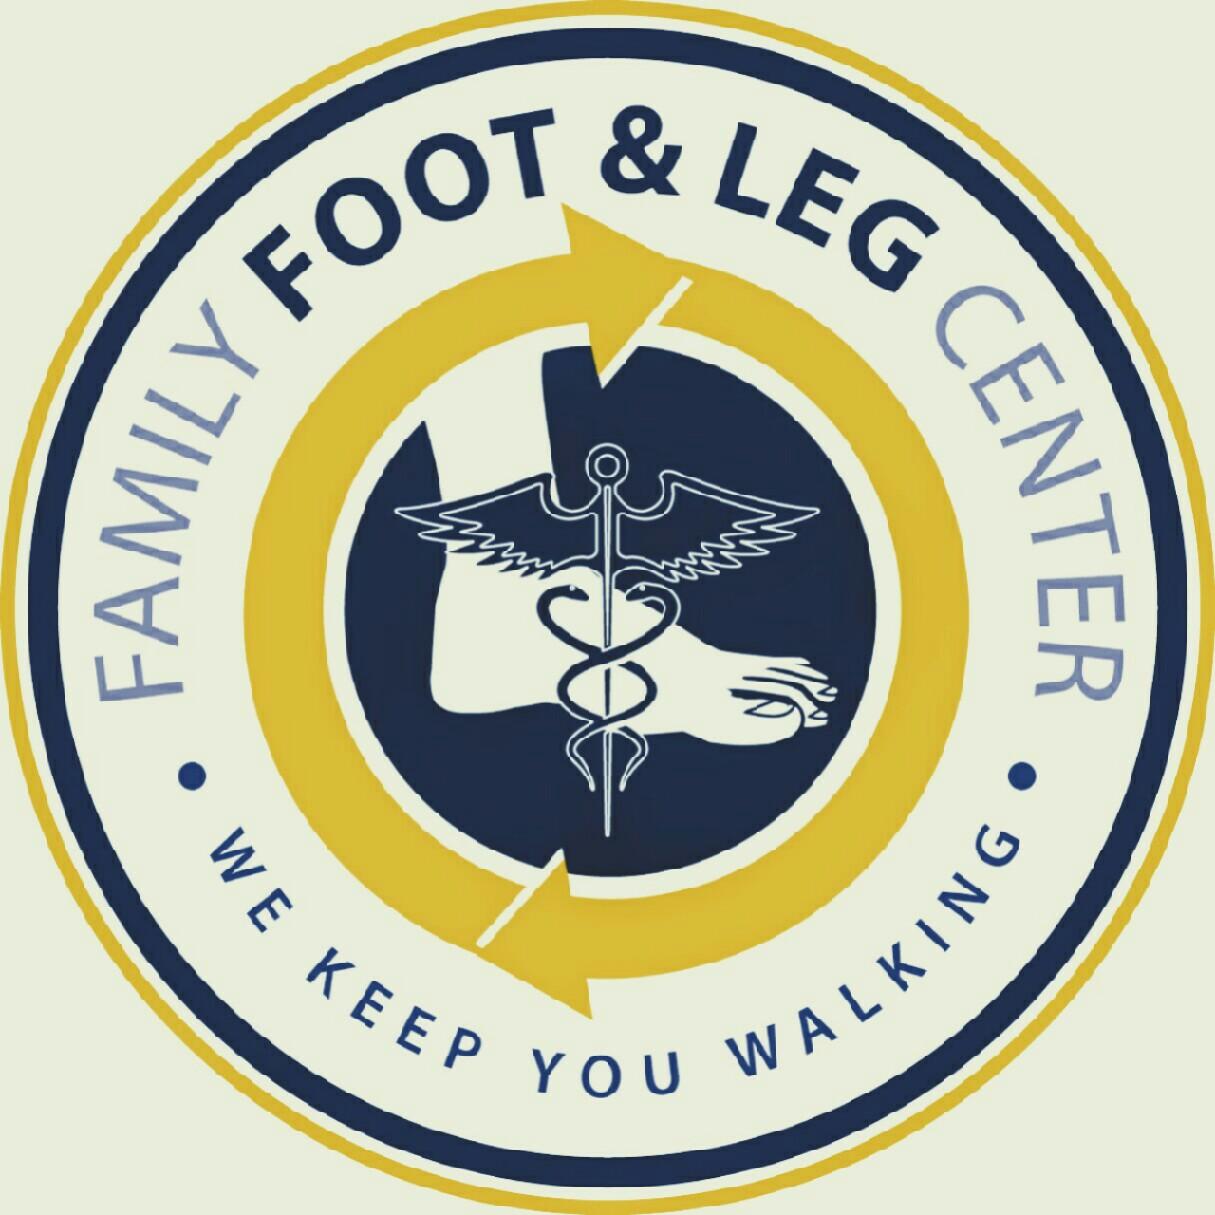 Family Foot and Leg Center, Downtown Naples: Dr. Kevin Lam , Dr. Glenn Woodley, Dr. Lauren Pelucacci